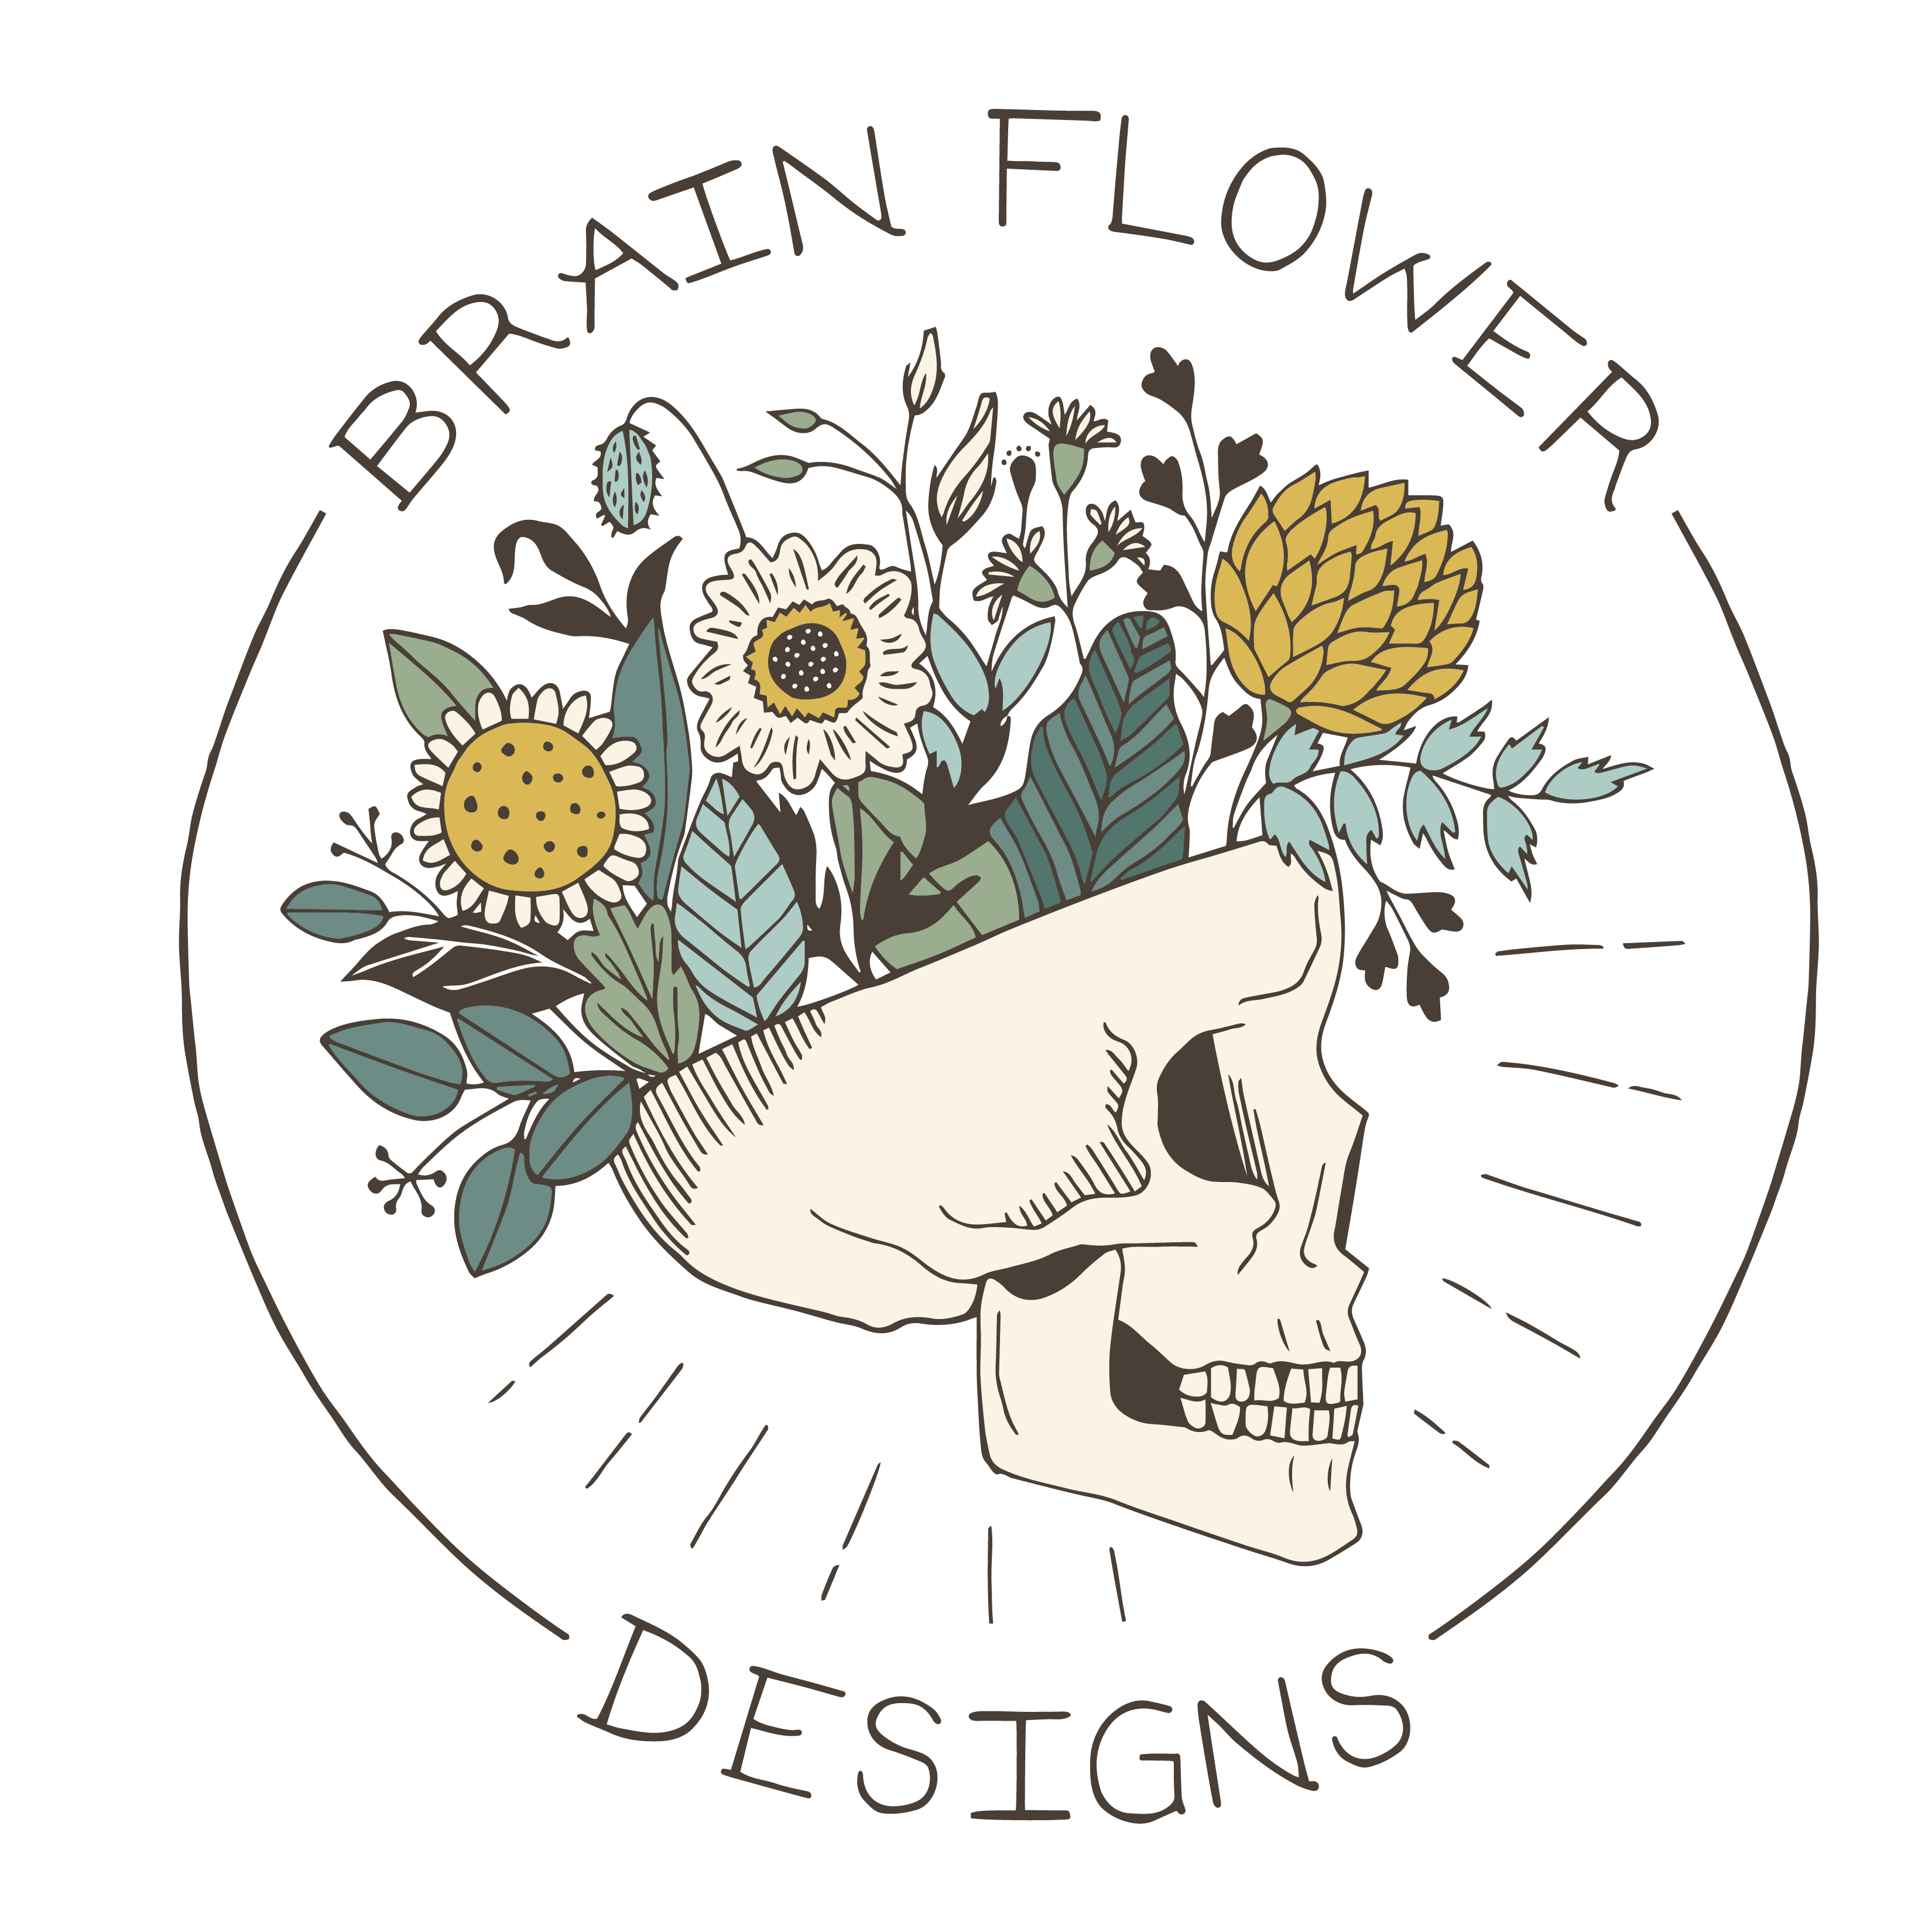 Brainflower.jpg